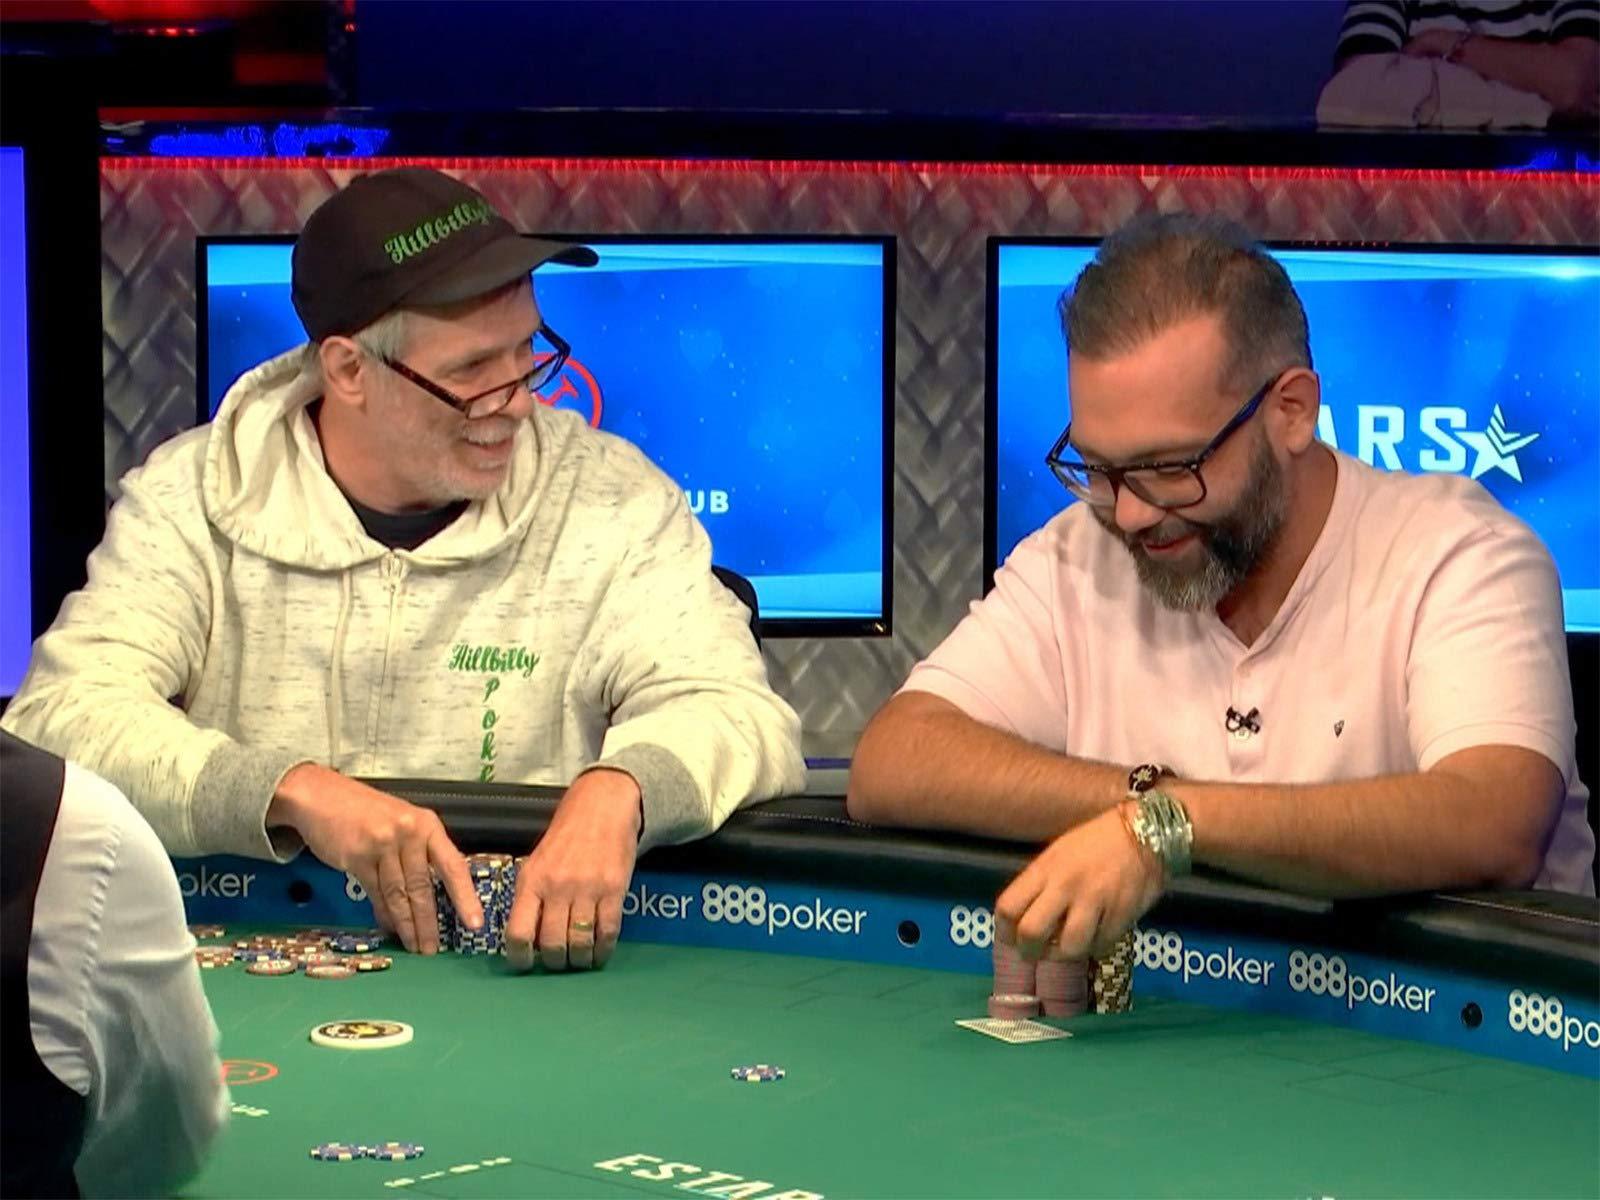 Bgo vegas casino roulette auszahlungen 0011001